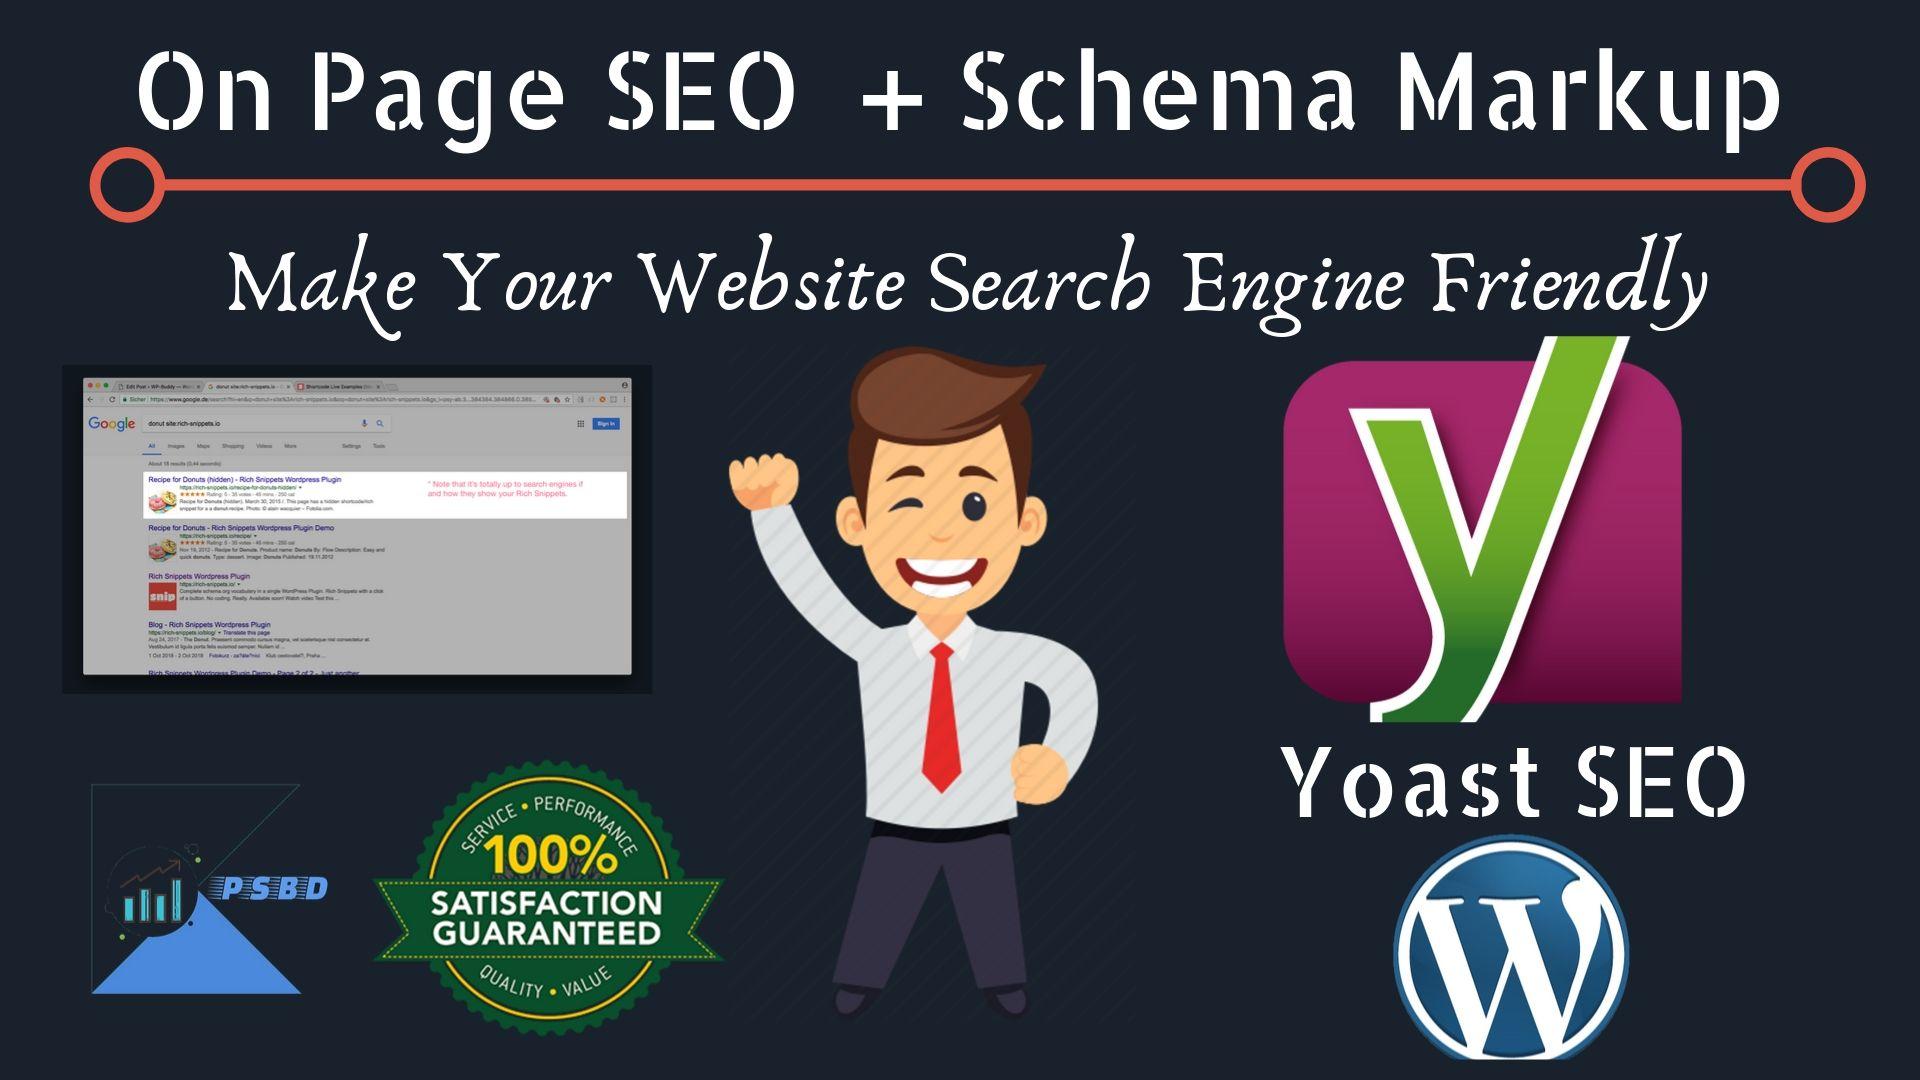 I will do WordPress Yoast SEO On Page with Schema Markup